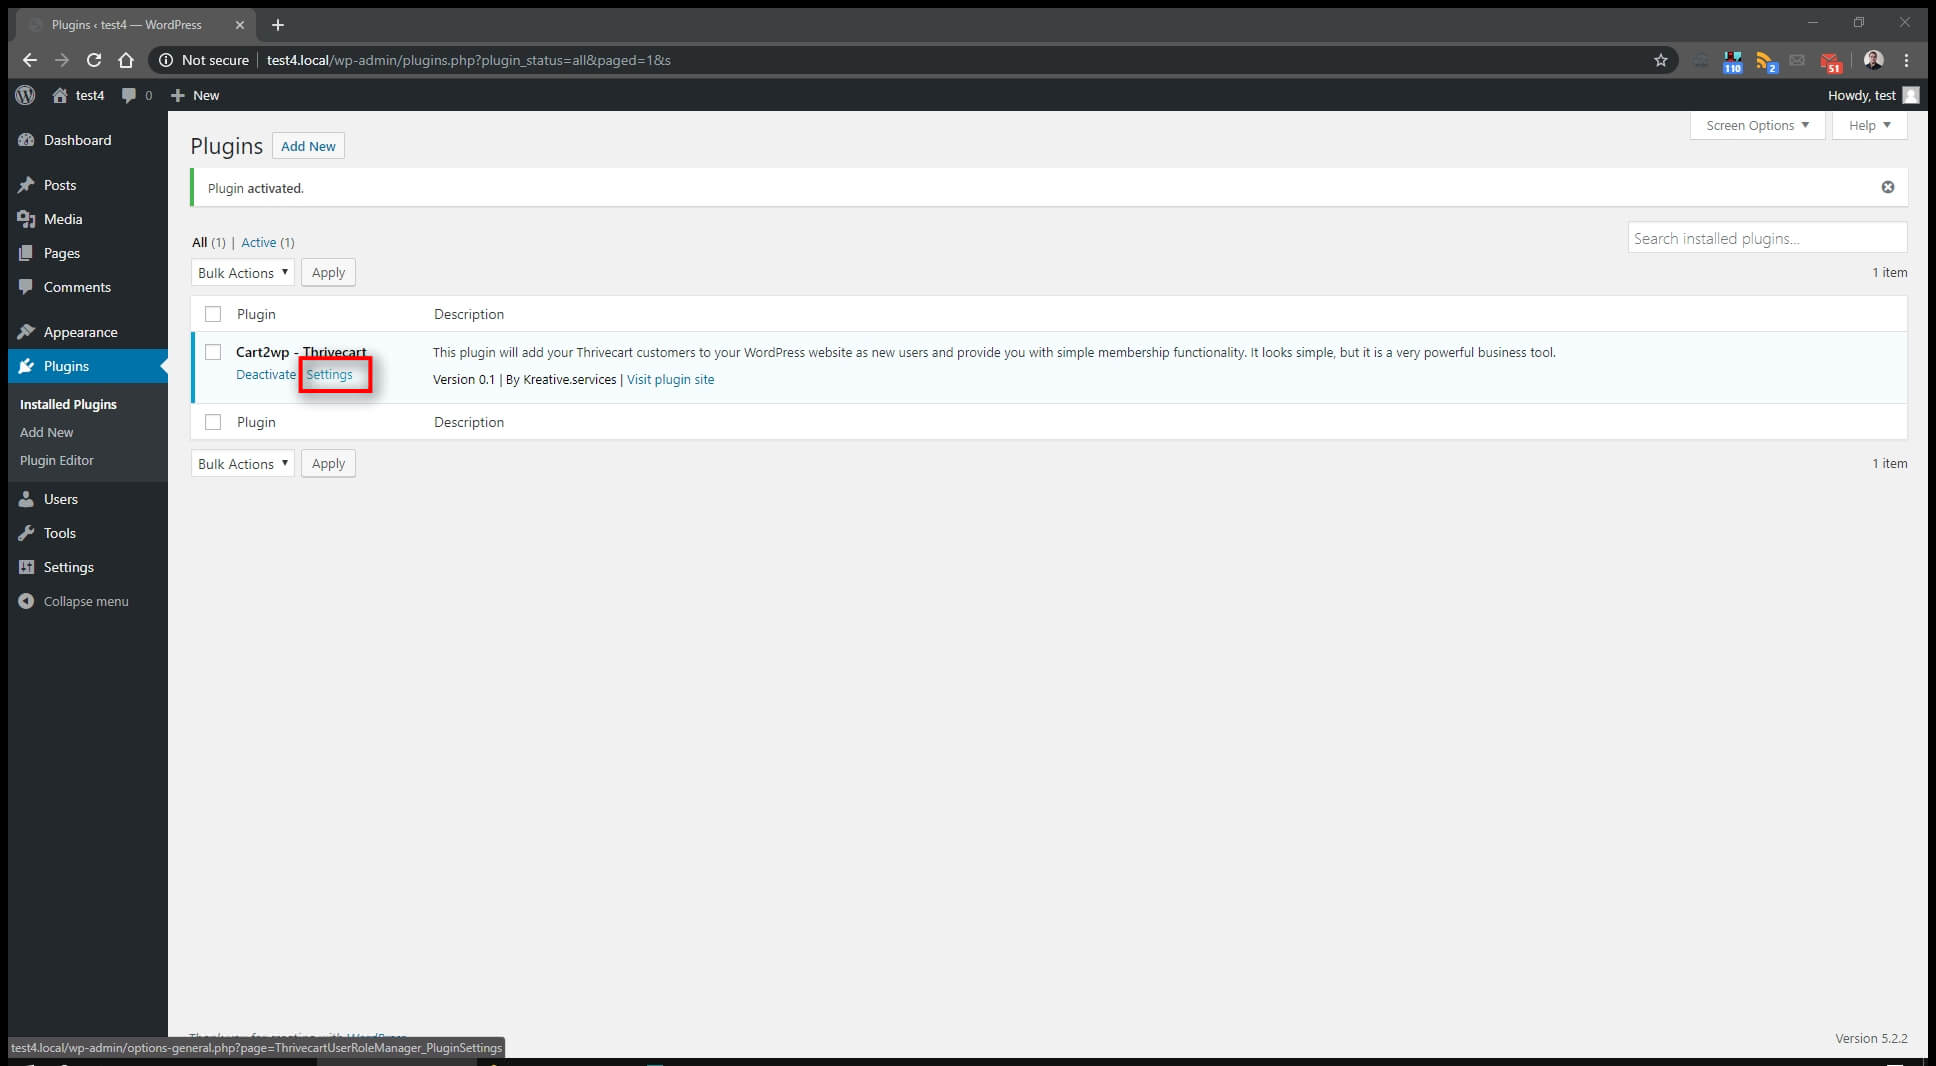 Cart2wp Thrivecart To WordPress Integration 3